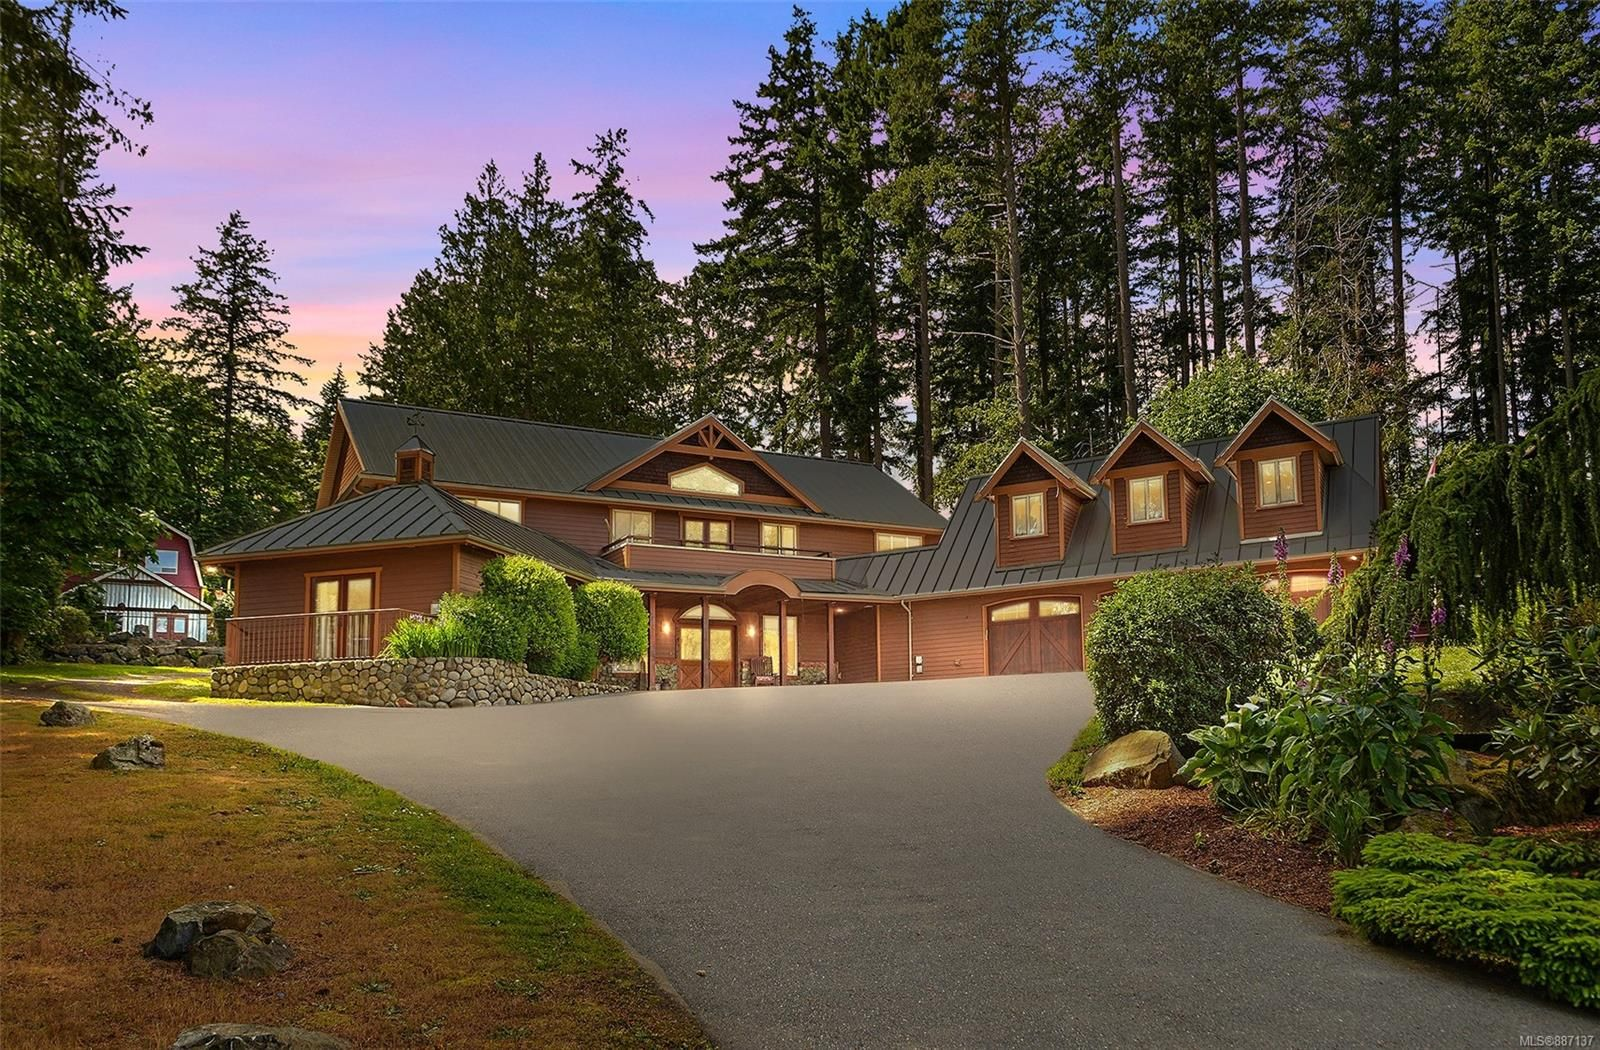 Main Photo: 5548 Alderley Rd in Saanich: SE Cordova Bay House for sale (Saanich East)  : MLS®# 887137